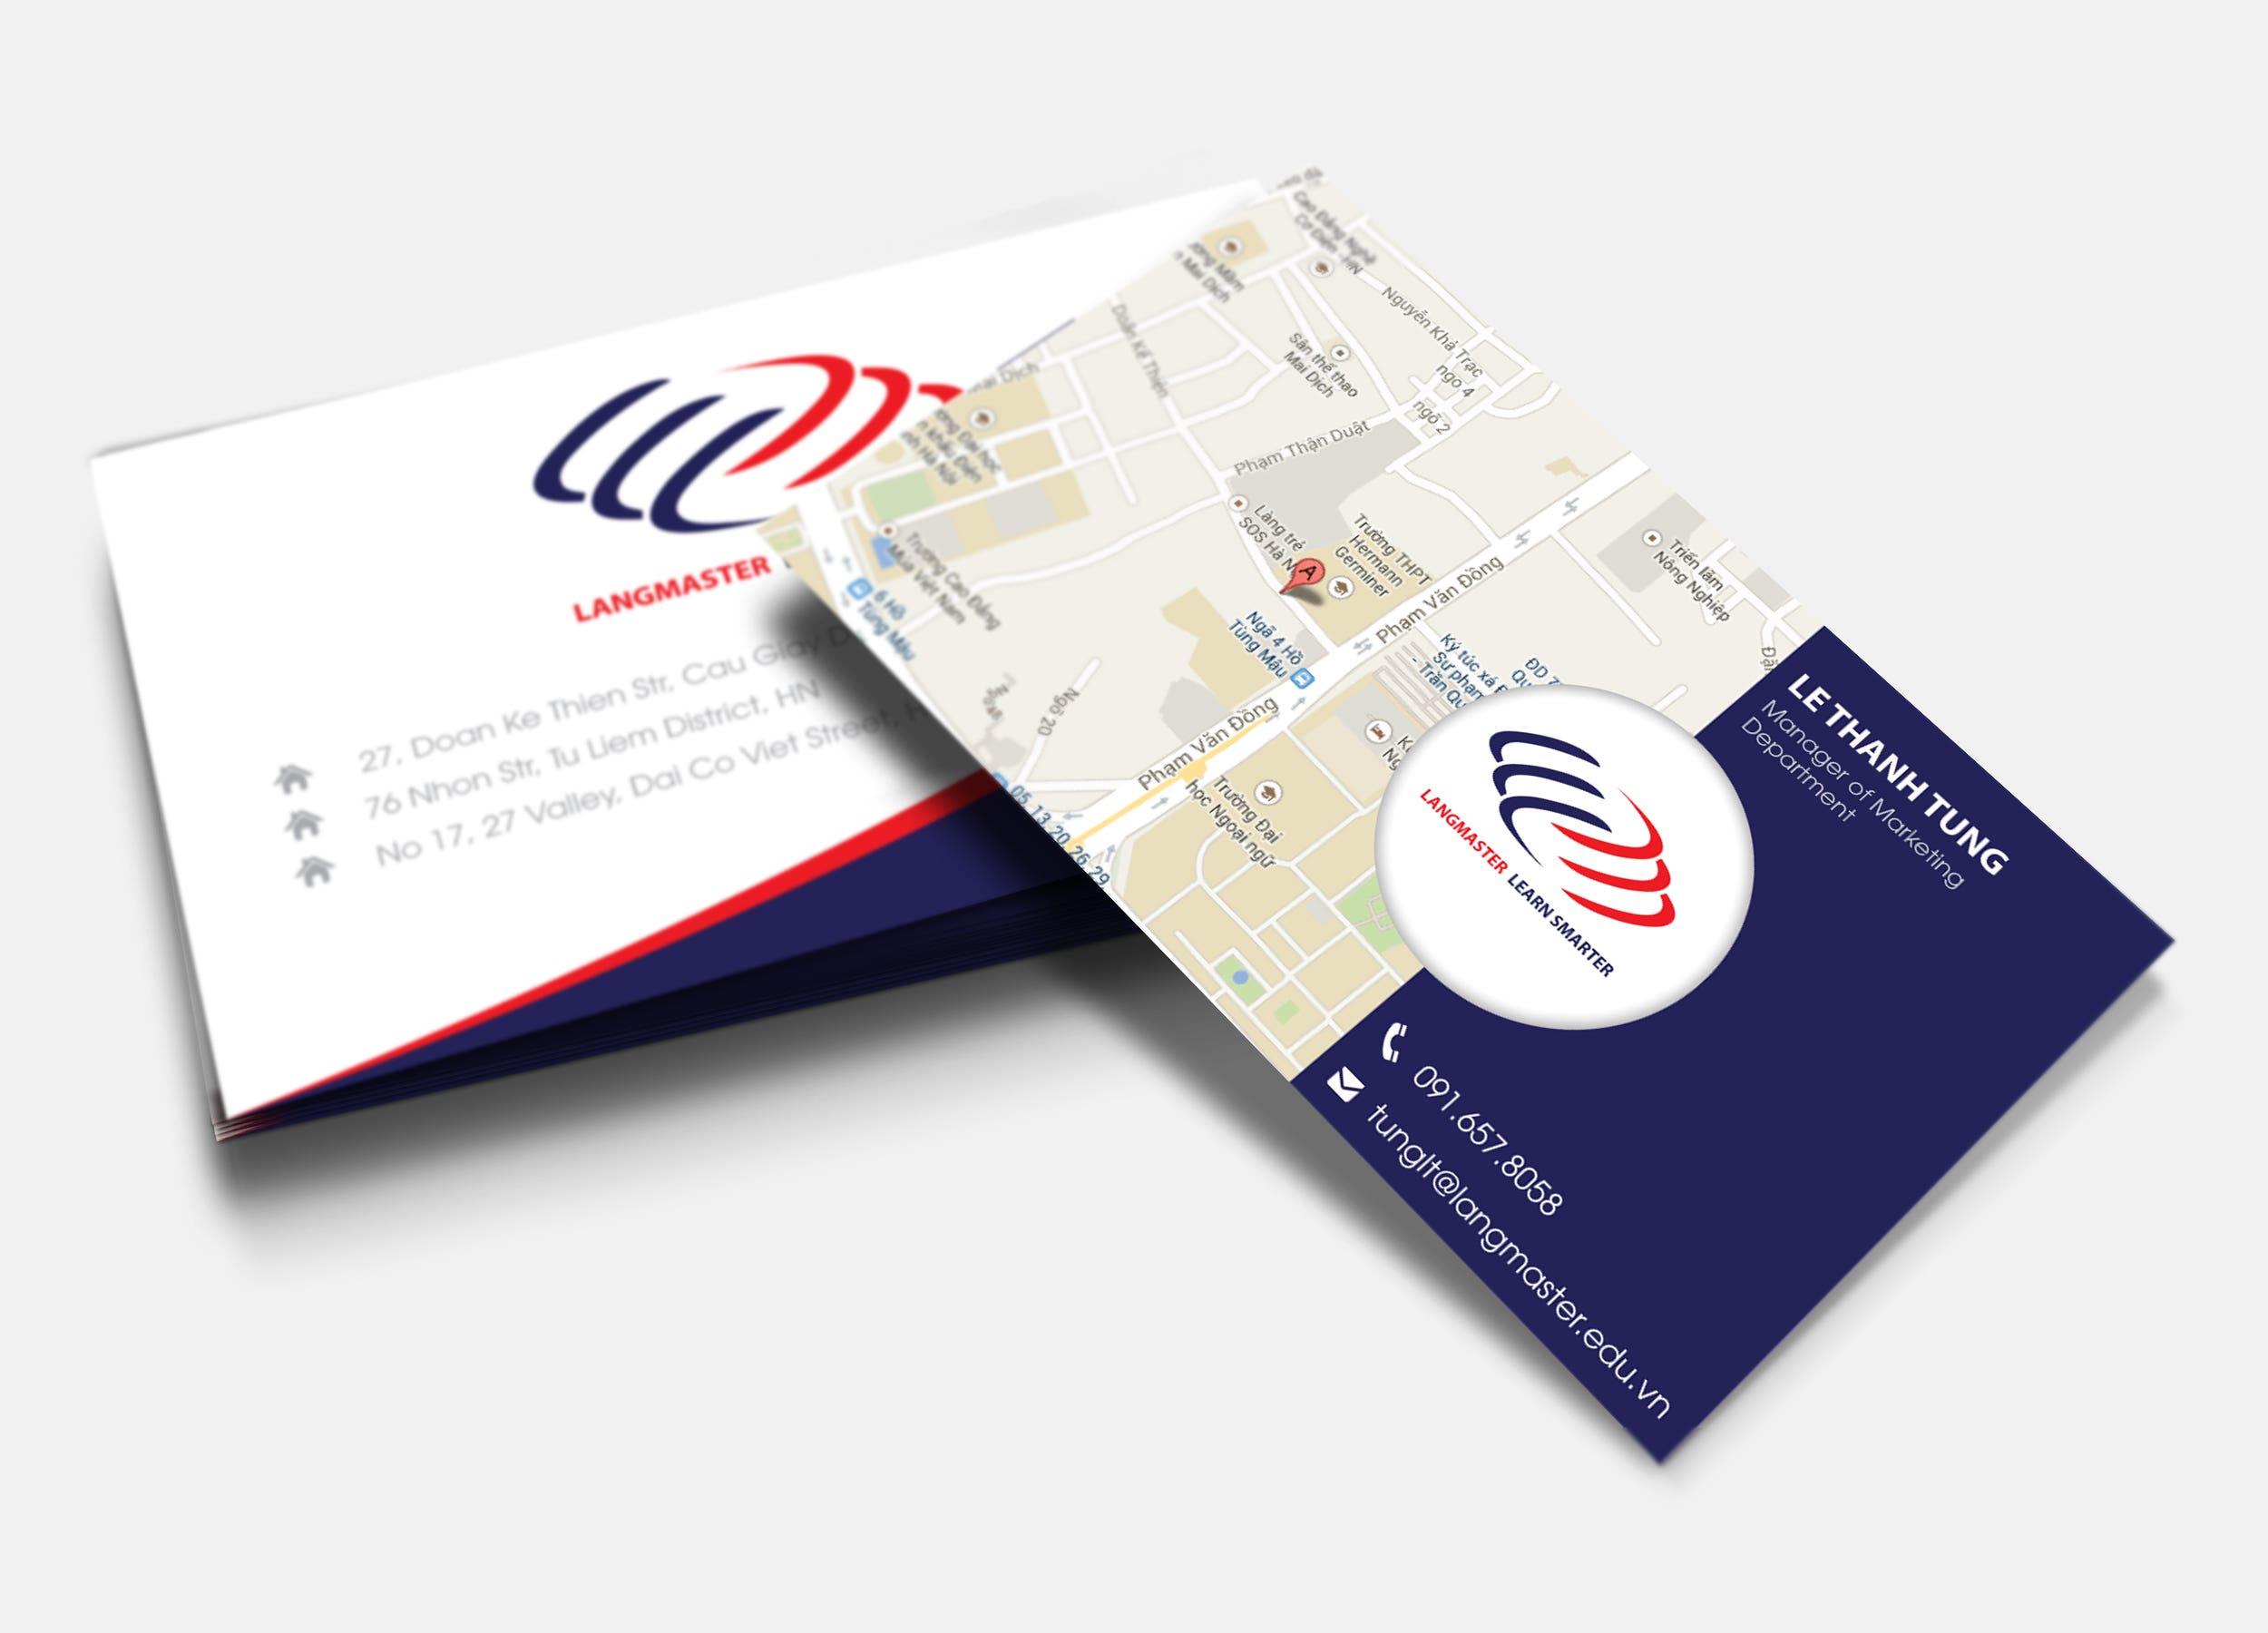 Langmaster company card 2